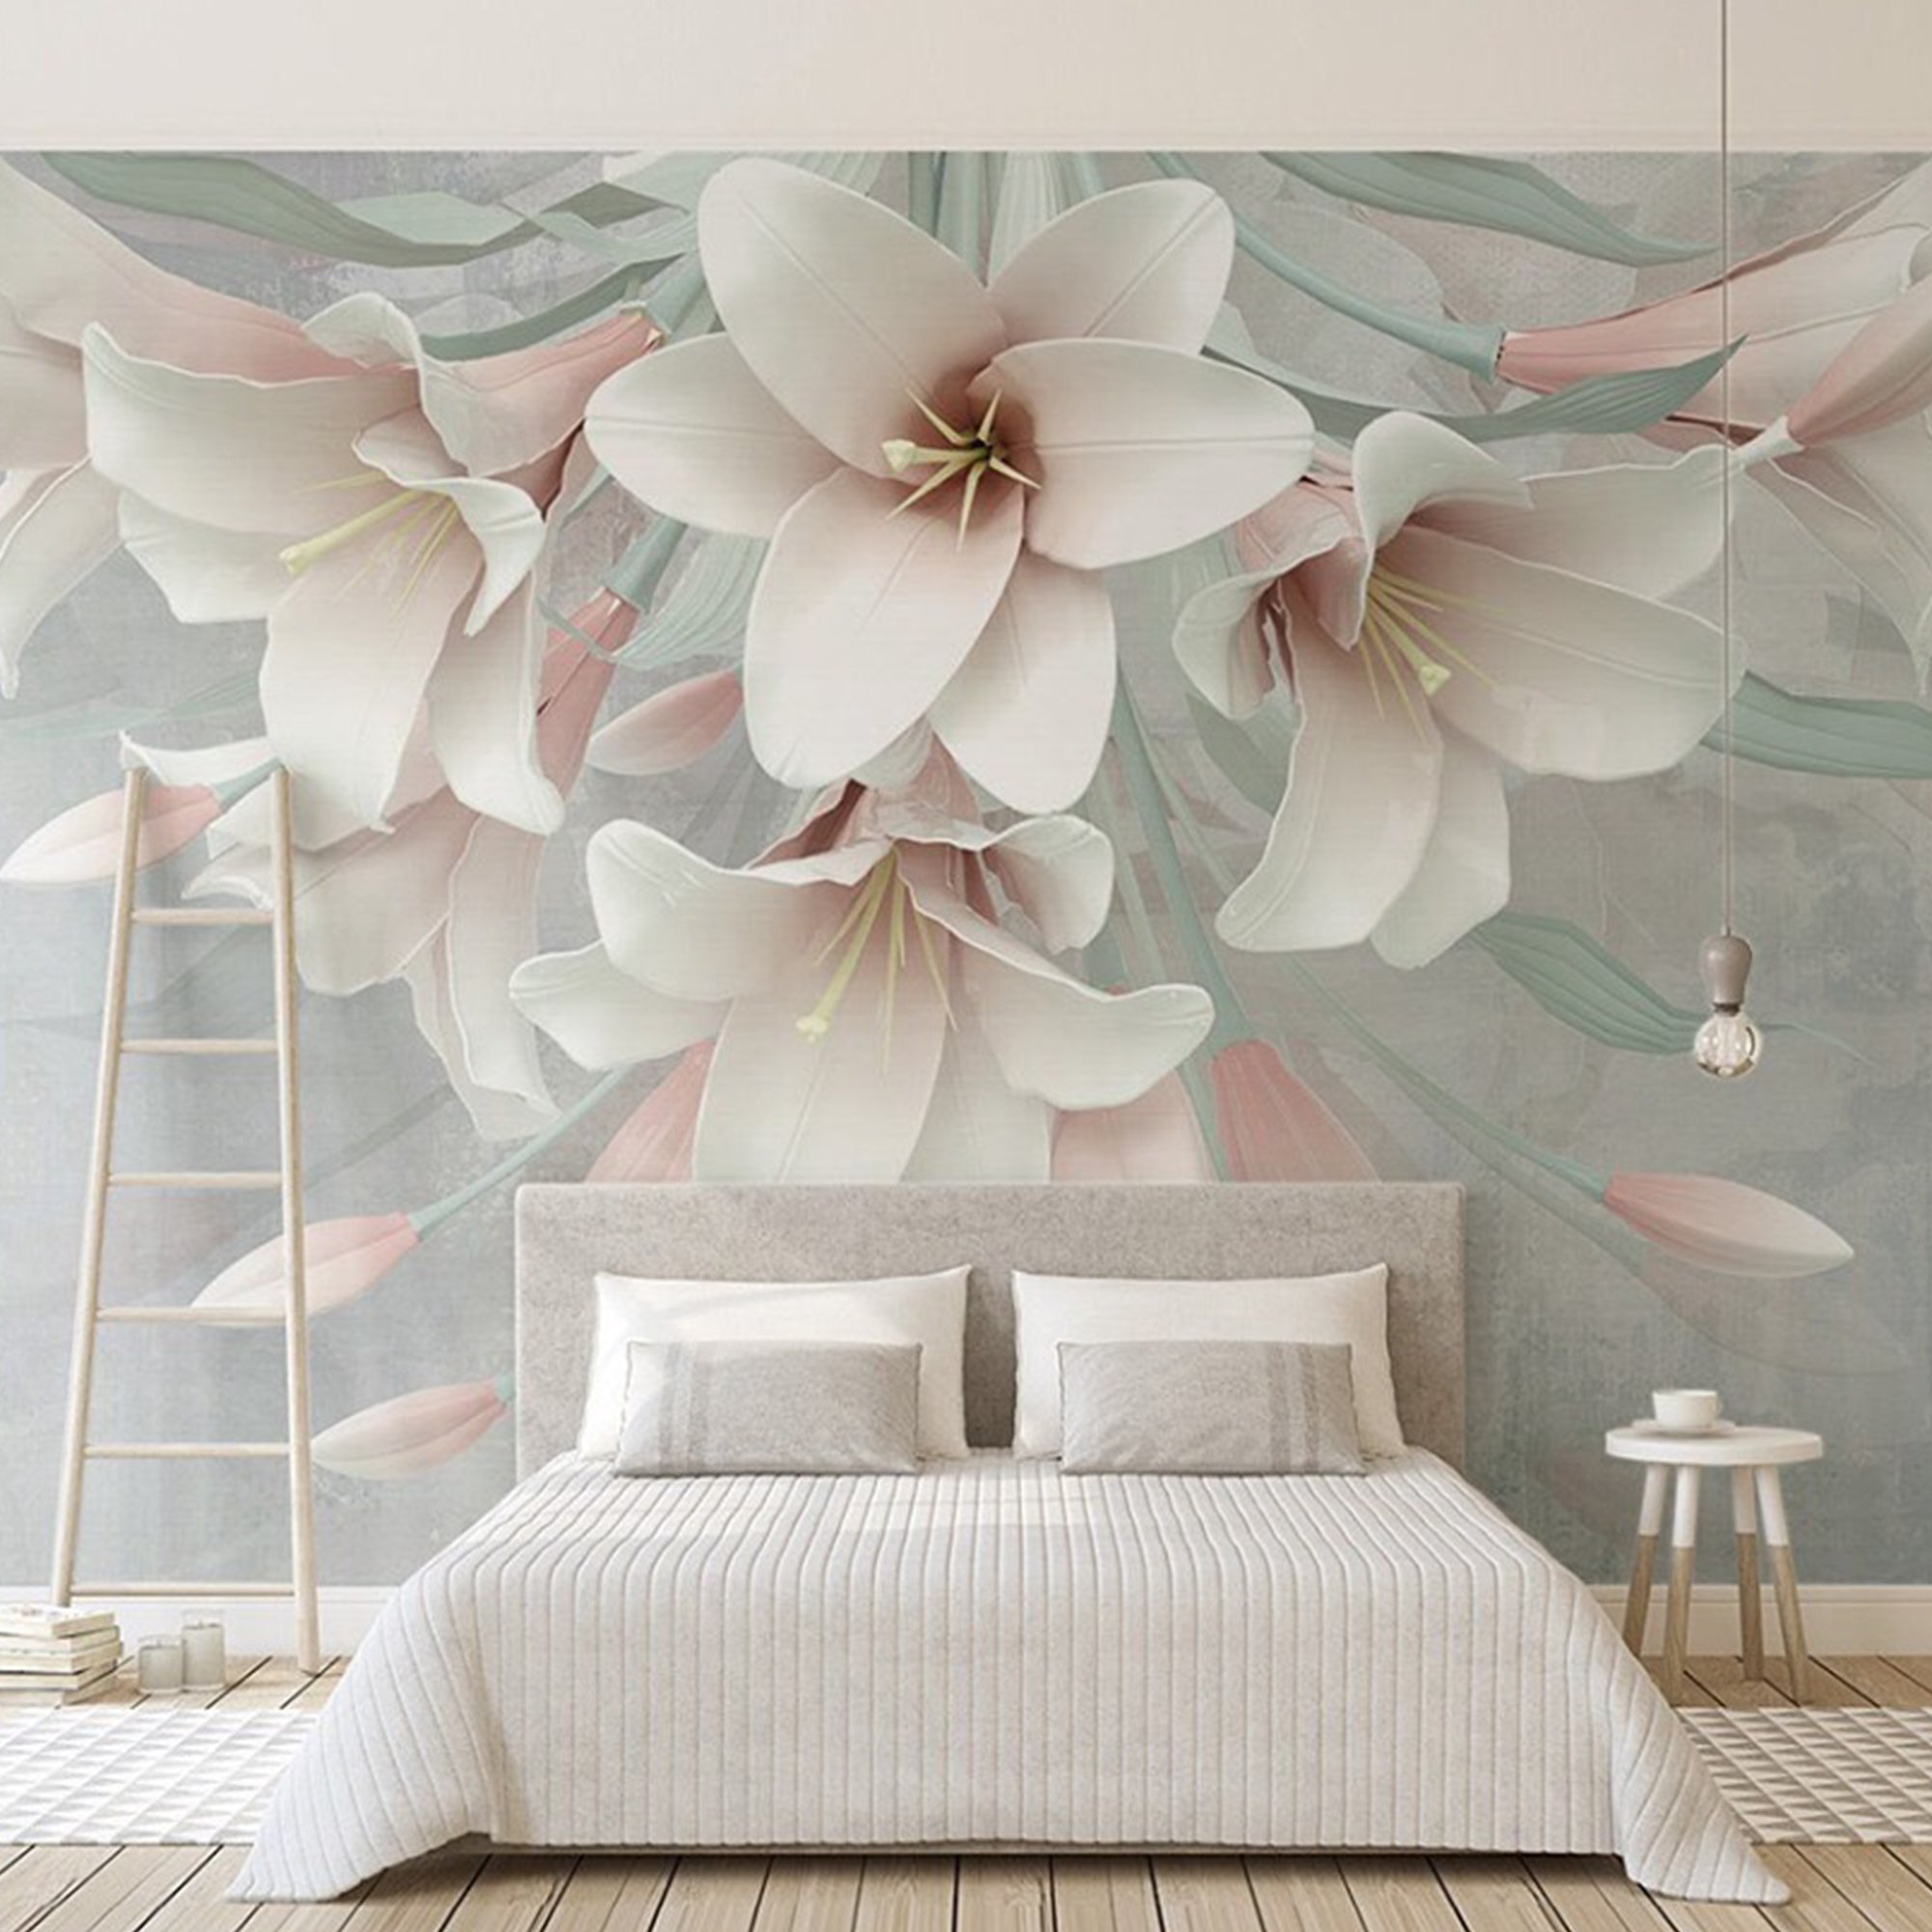 Tranh dán tường hoa ly